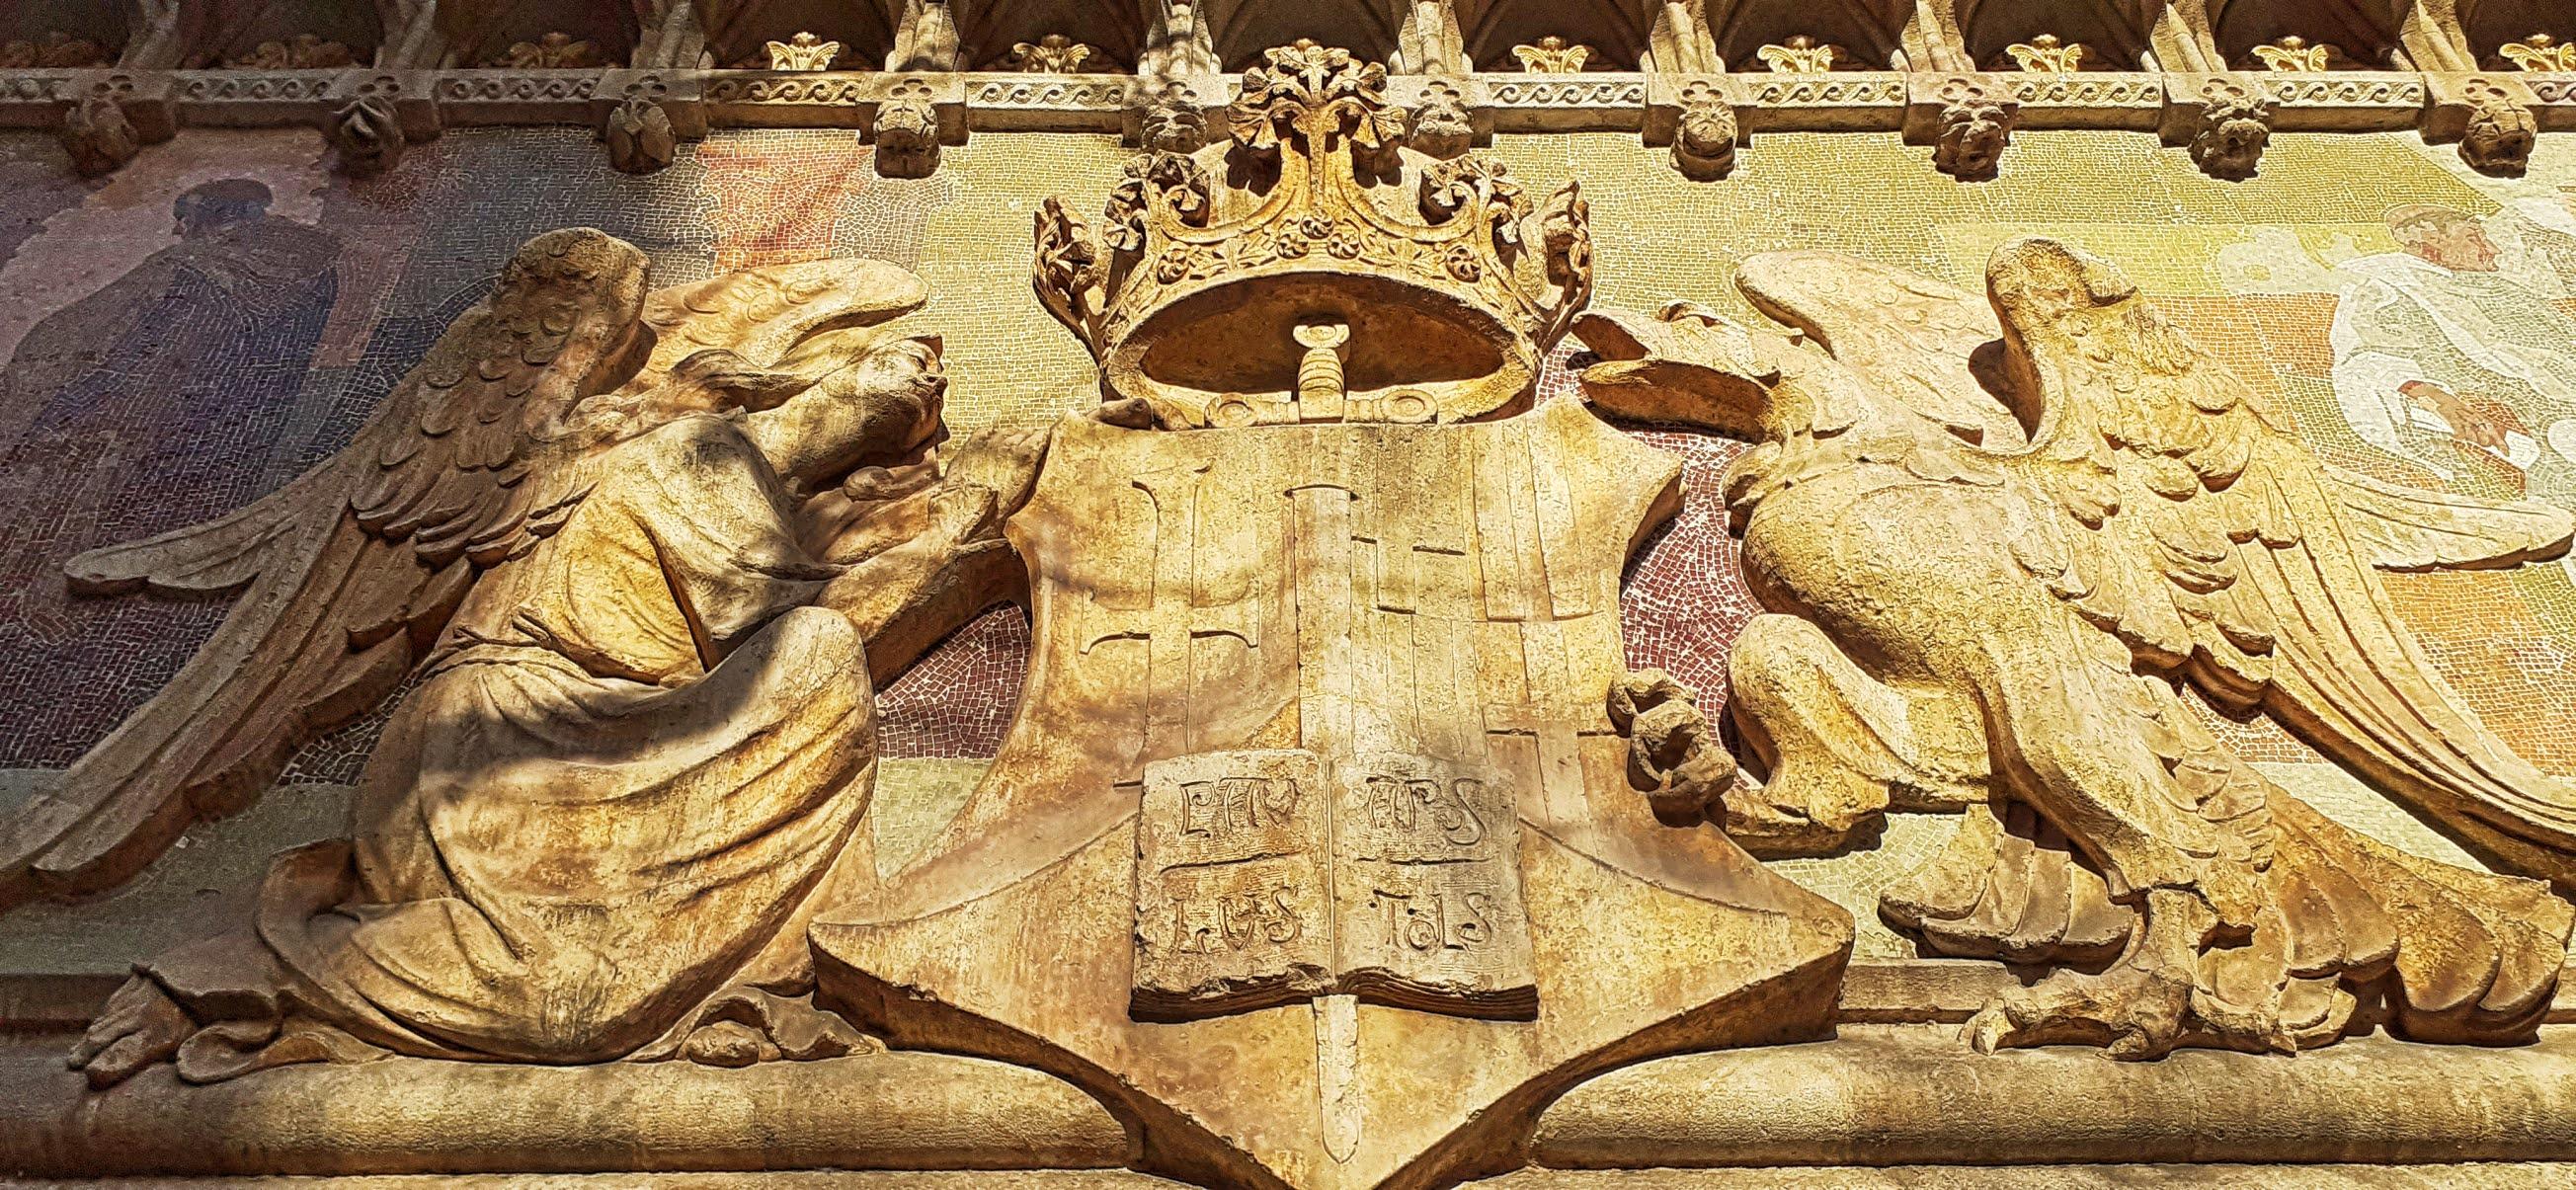 Sant Pau shield detail at Cartagena street entrance